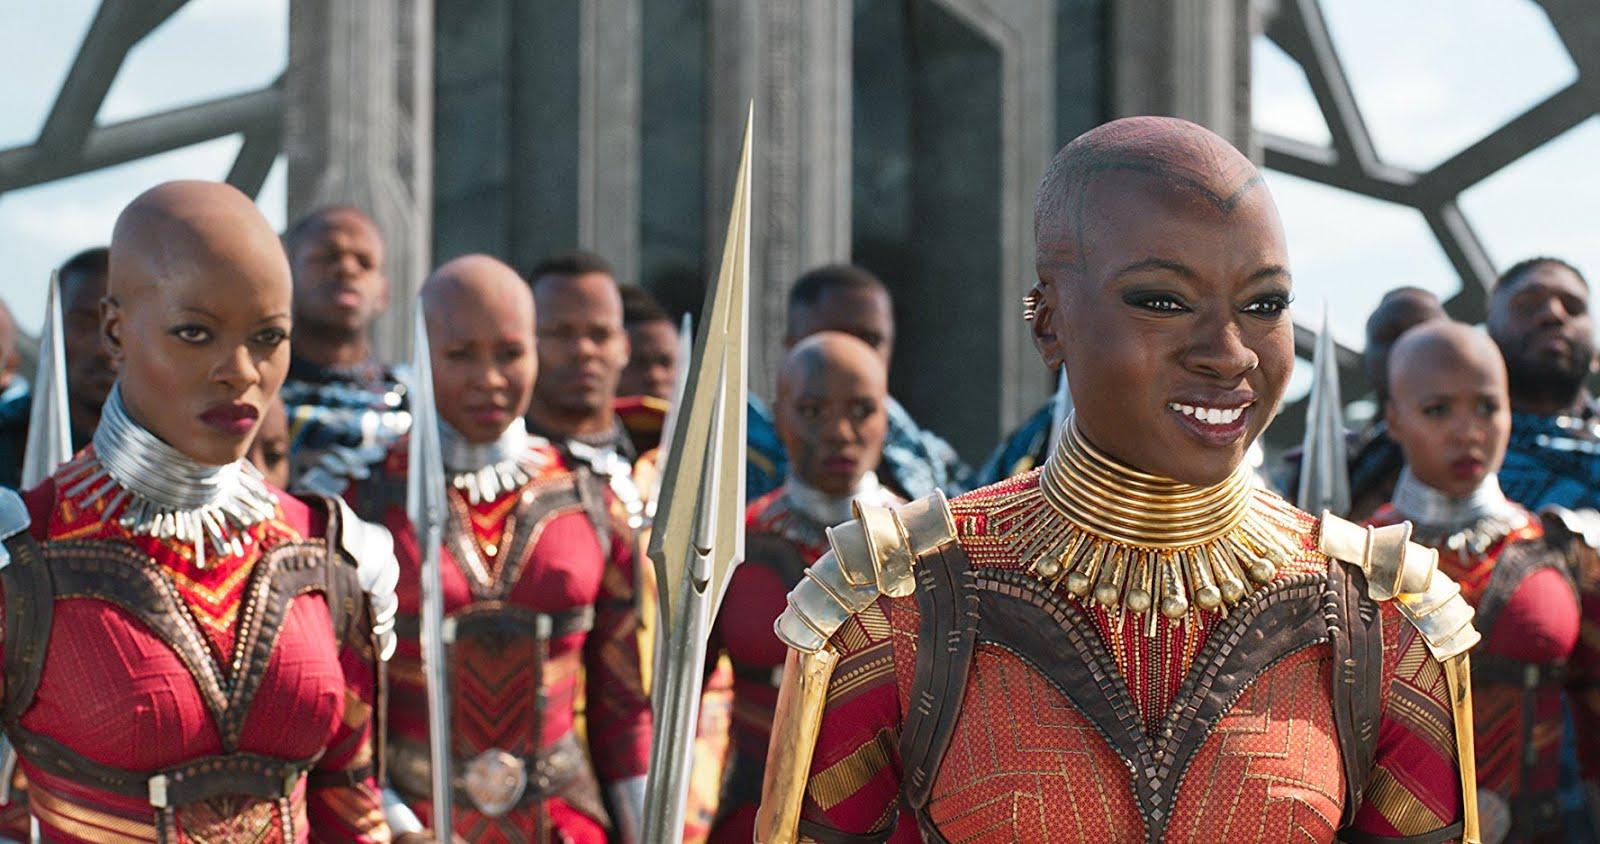 Meet the Author Behind 'Wakanda Forever,' Marvel's New Comic Featuring Spider Man and Wakanda's Female Warriors